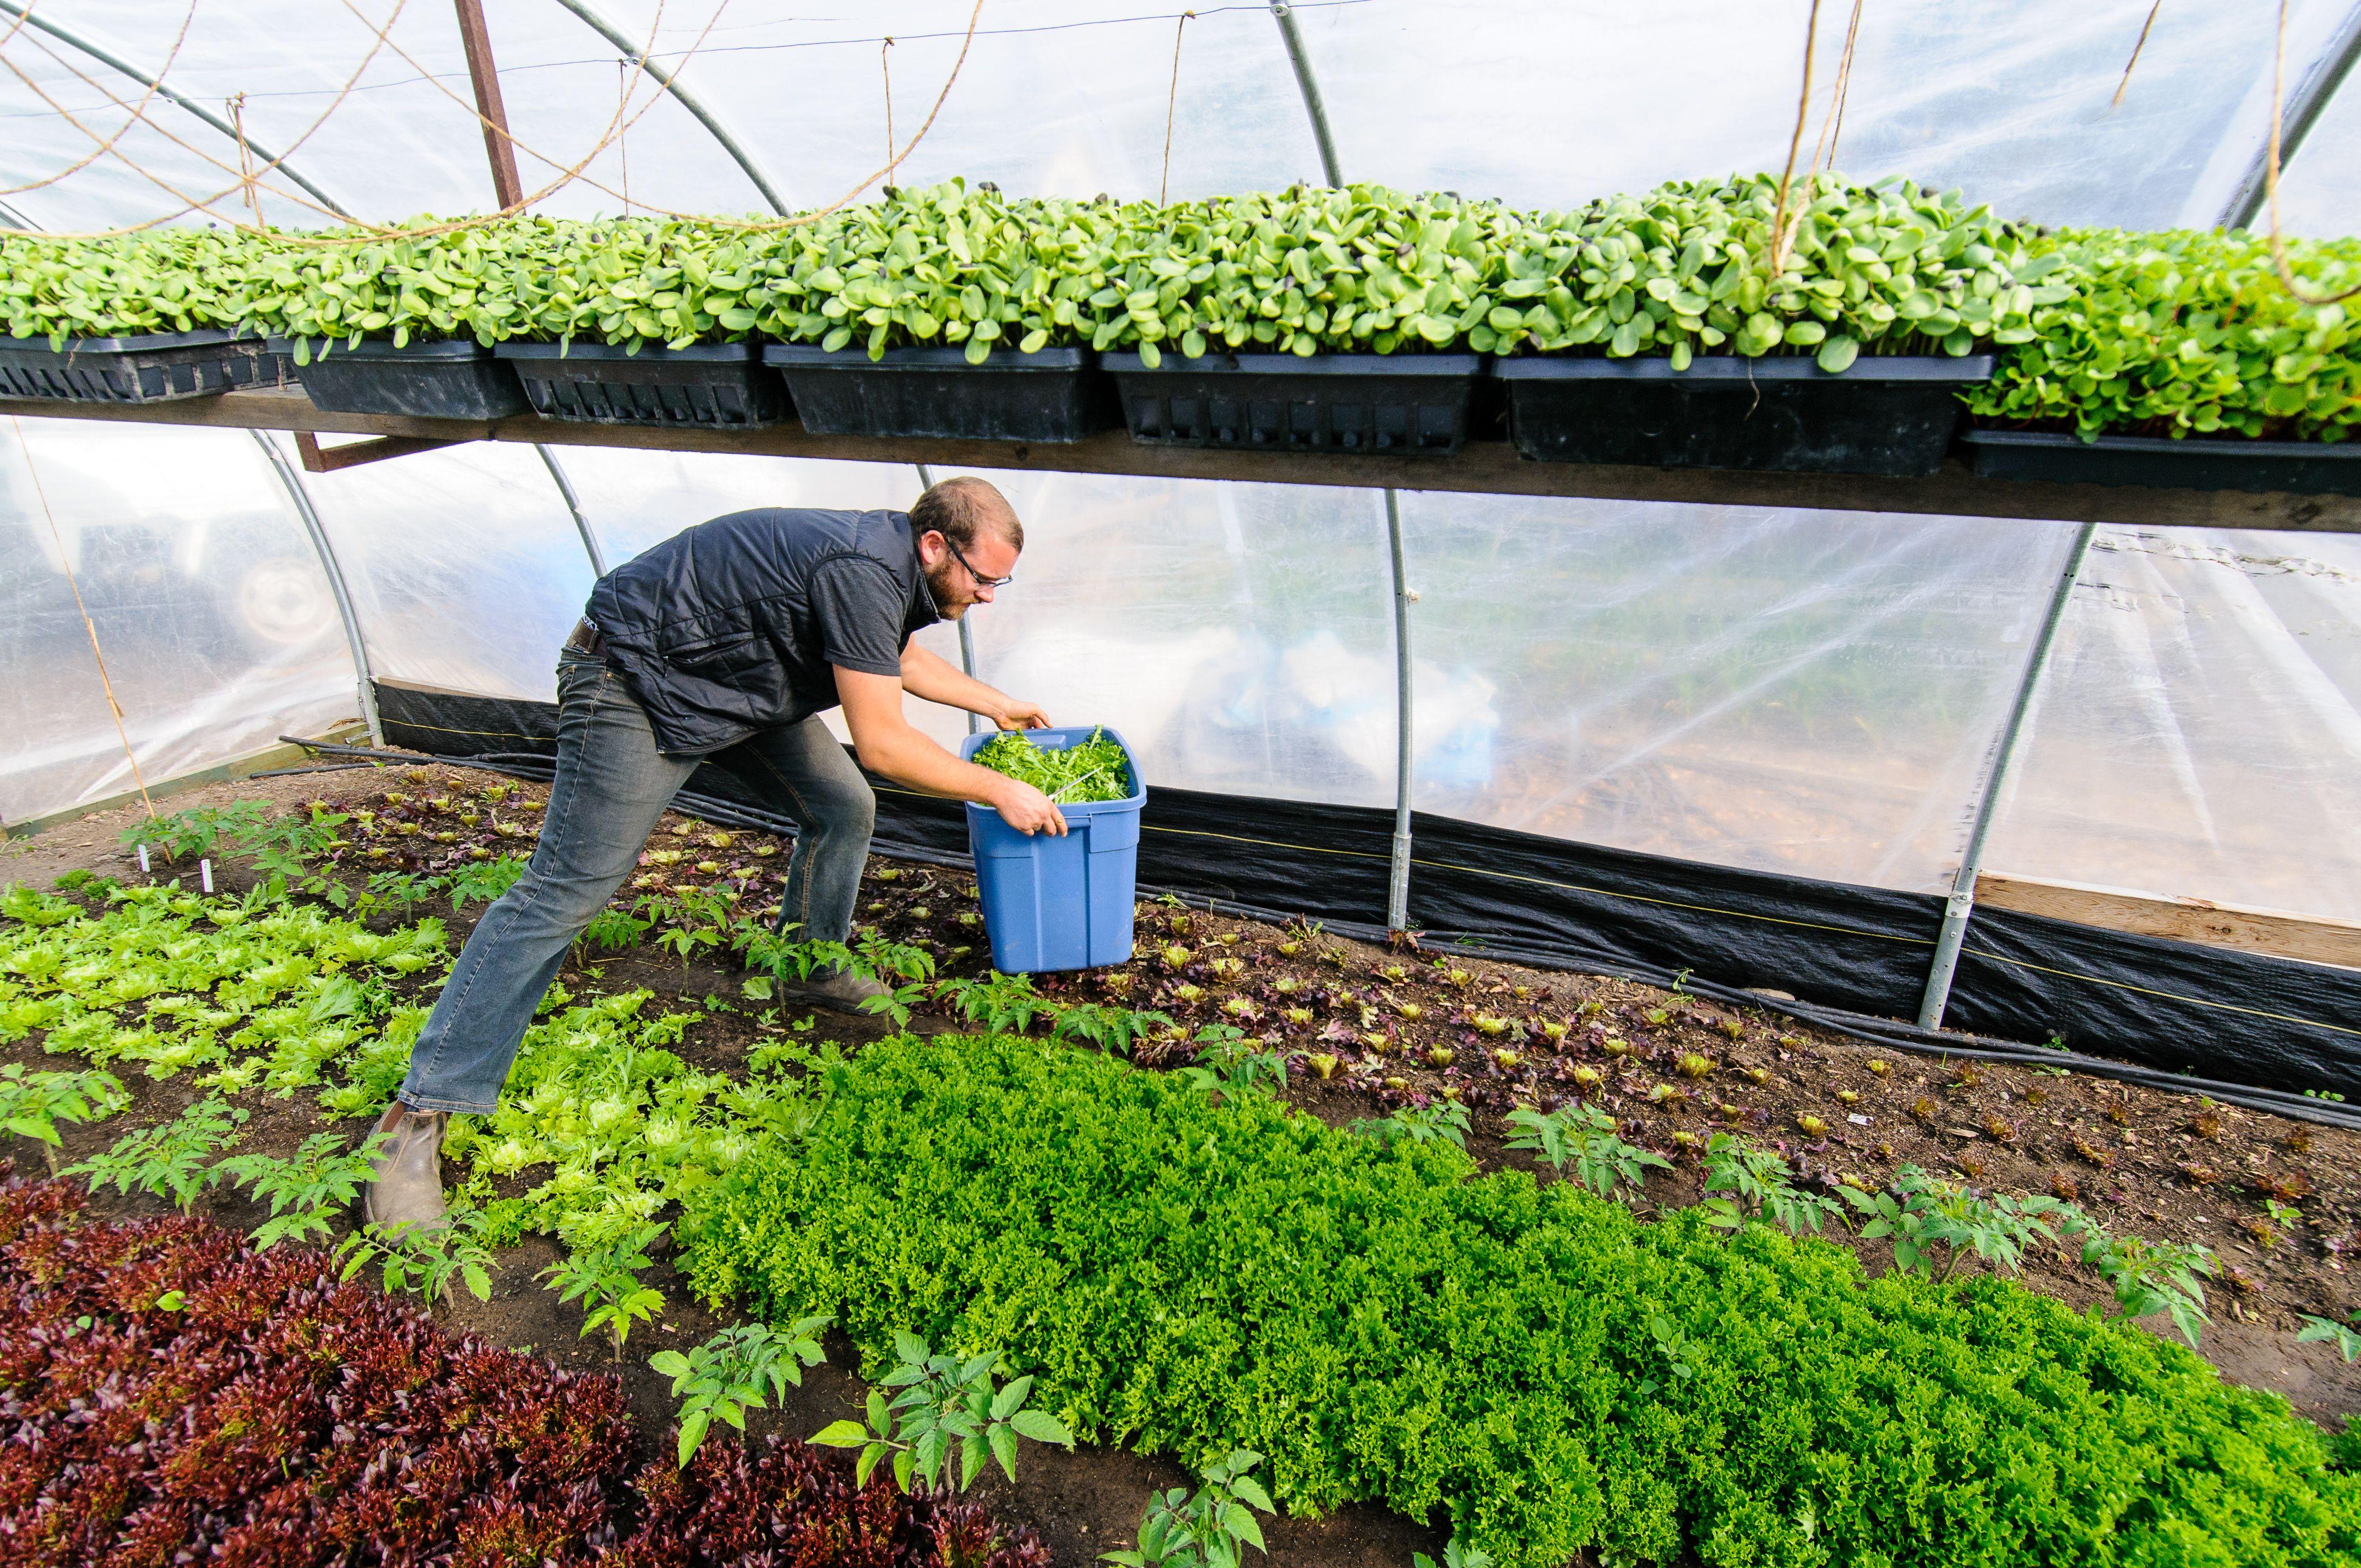 Urban Farmers Can Earn 75 000 On 15 000 Square Feet Civil Eats Urban Farmer Urban Farming Urban Agriculture Urban backyard farming for profit